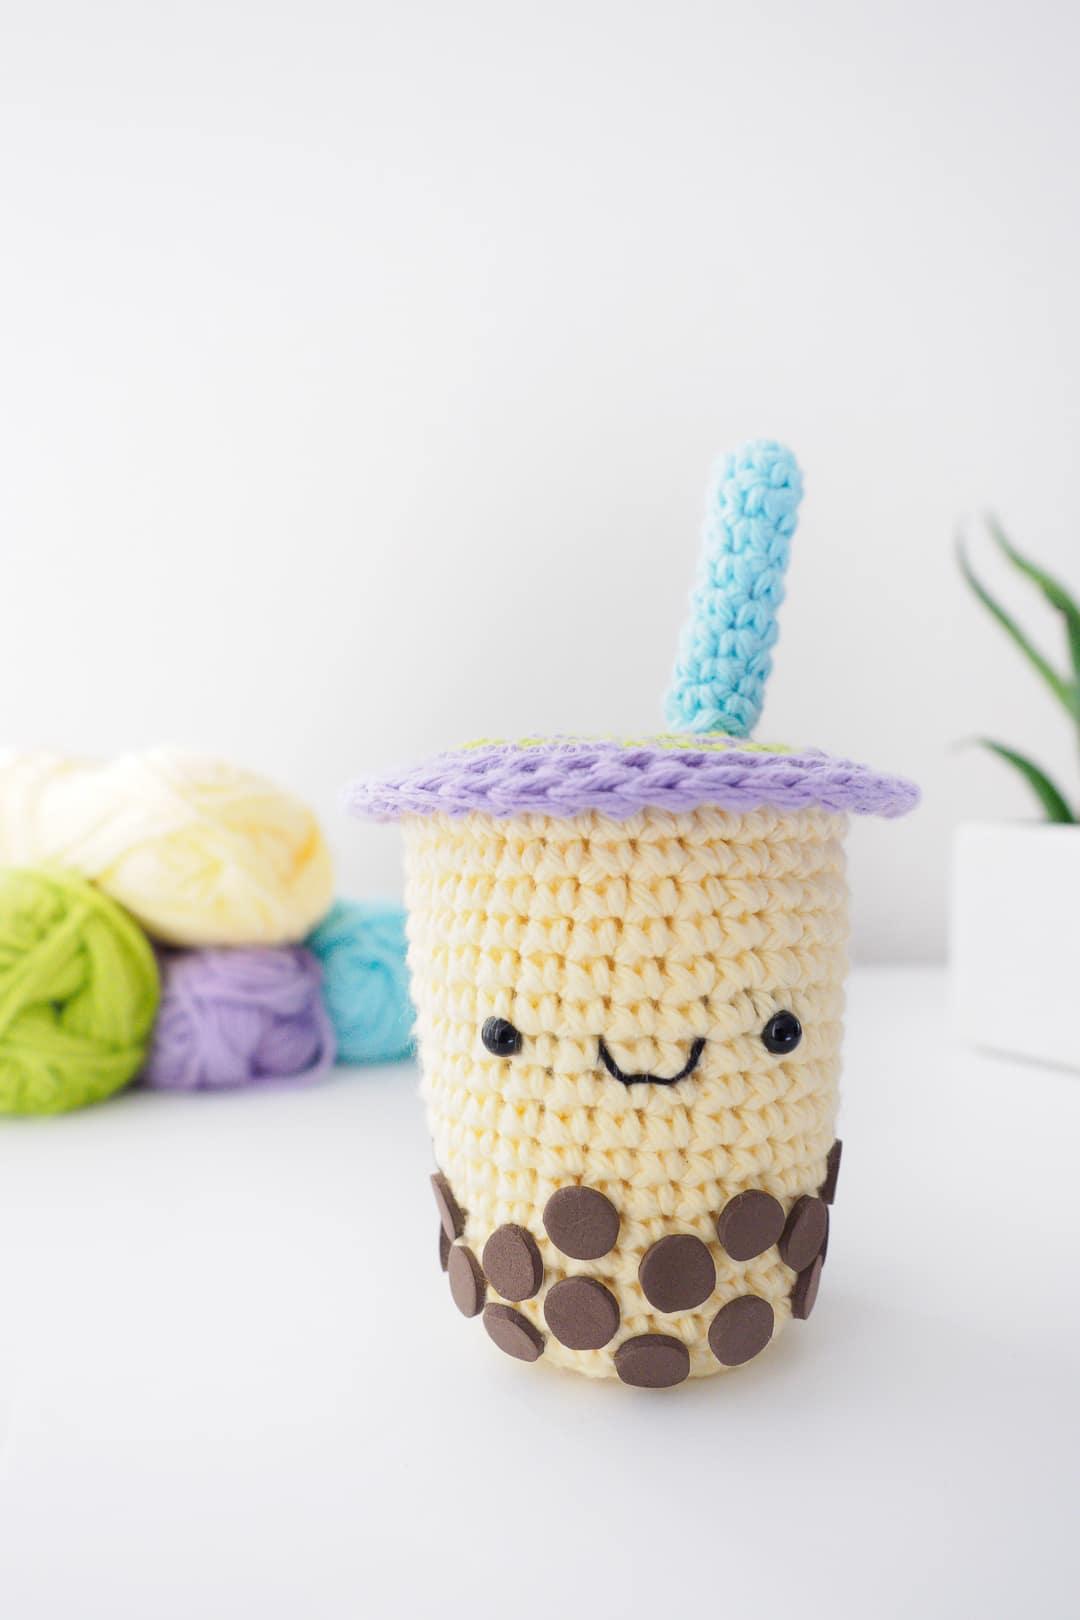 Boba Milk Tea Amigurumi Crochet Pattern